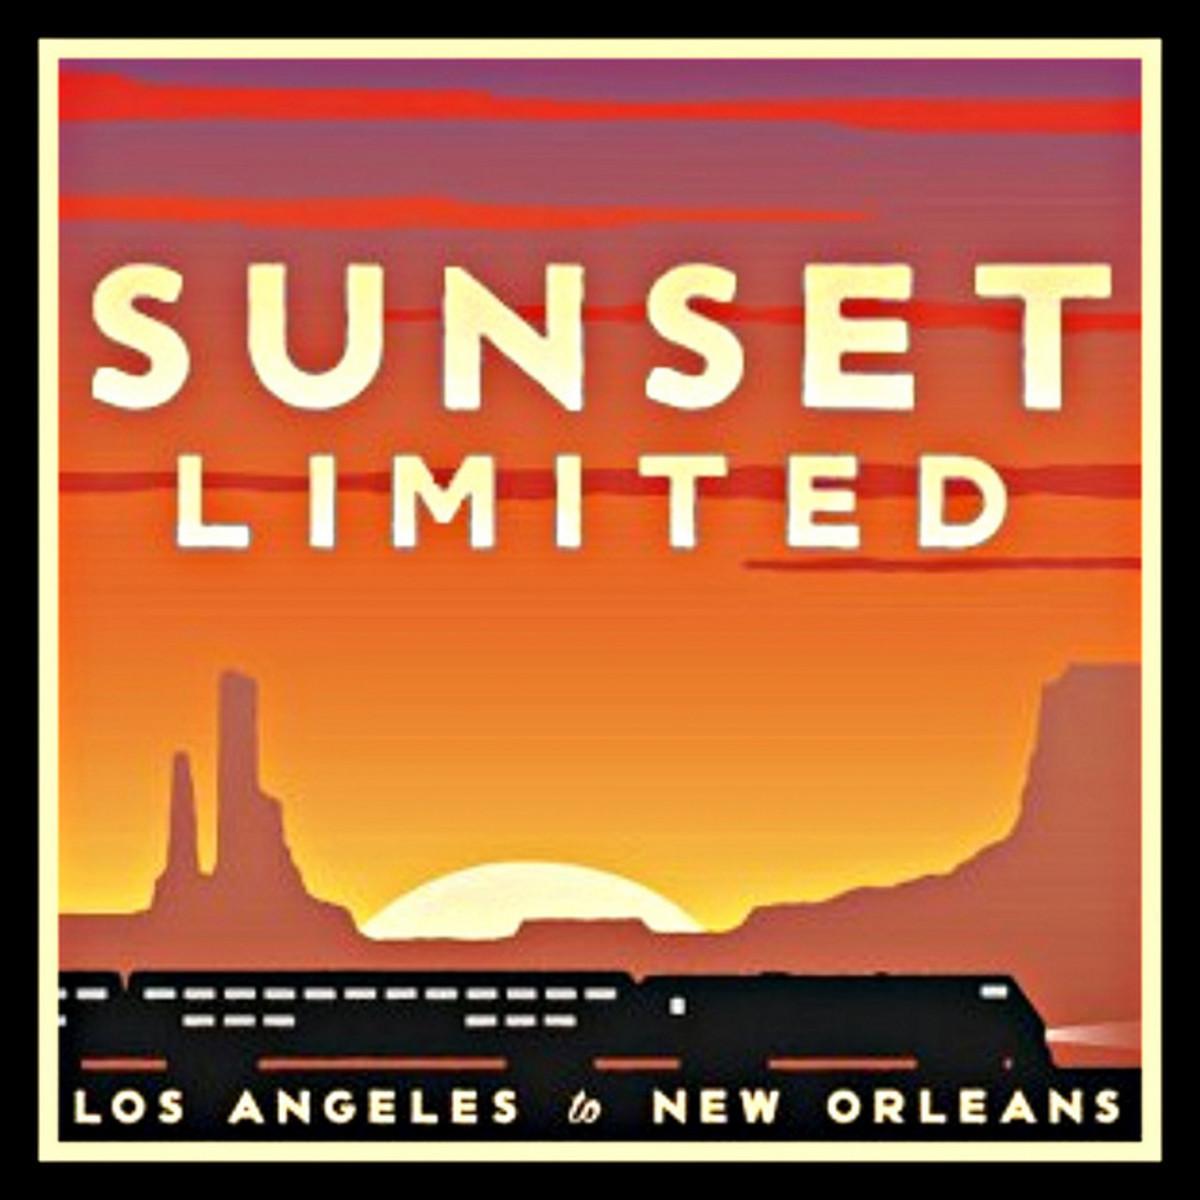 Amtrak 'sunset limited' Poster artwork Edited